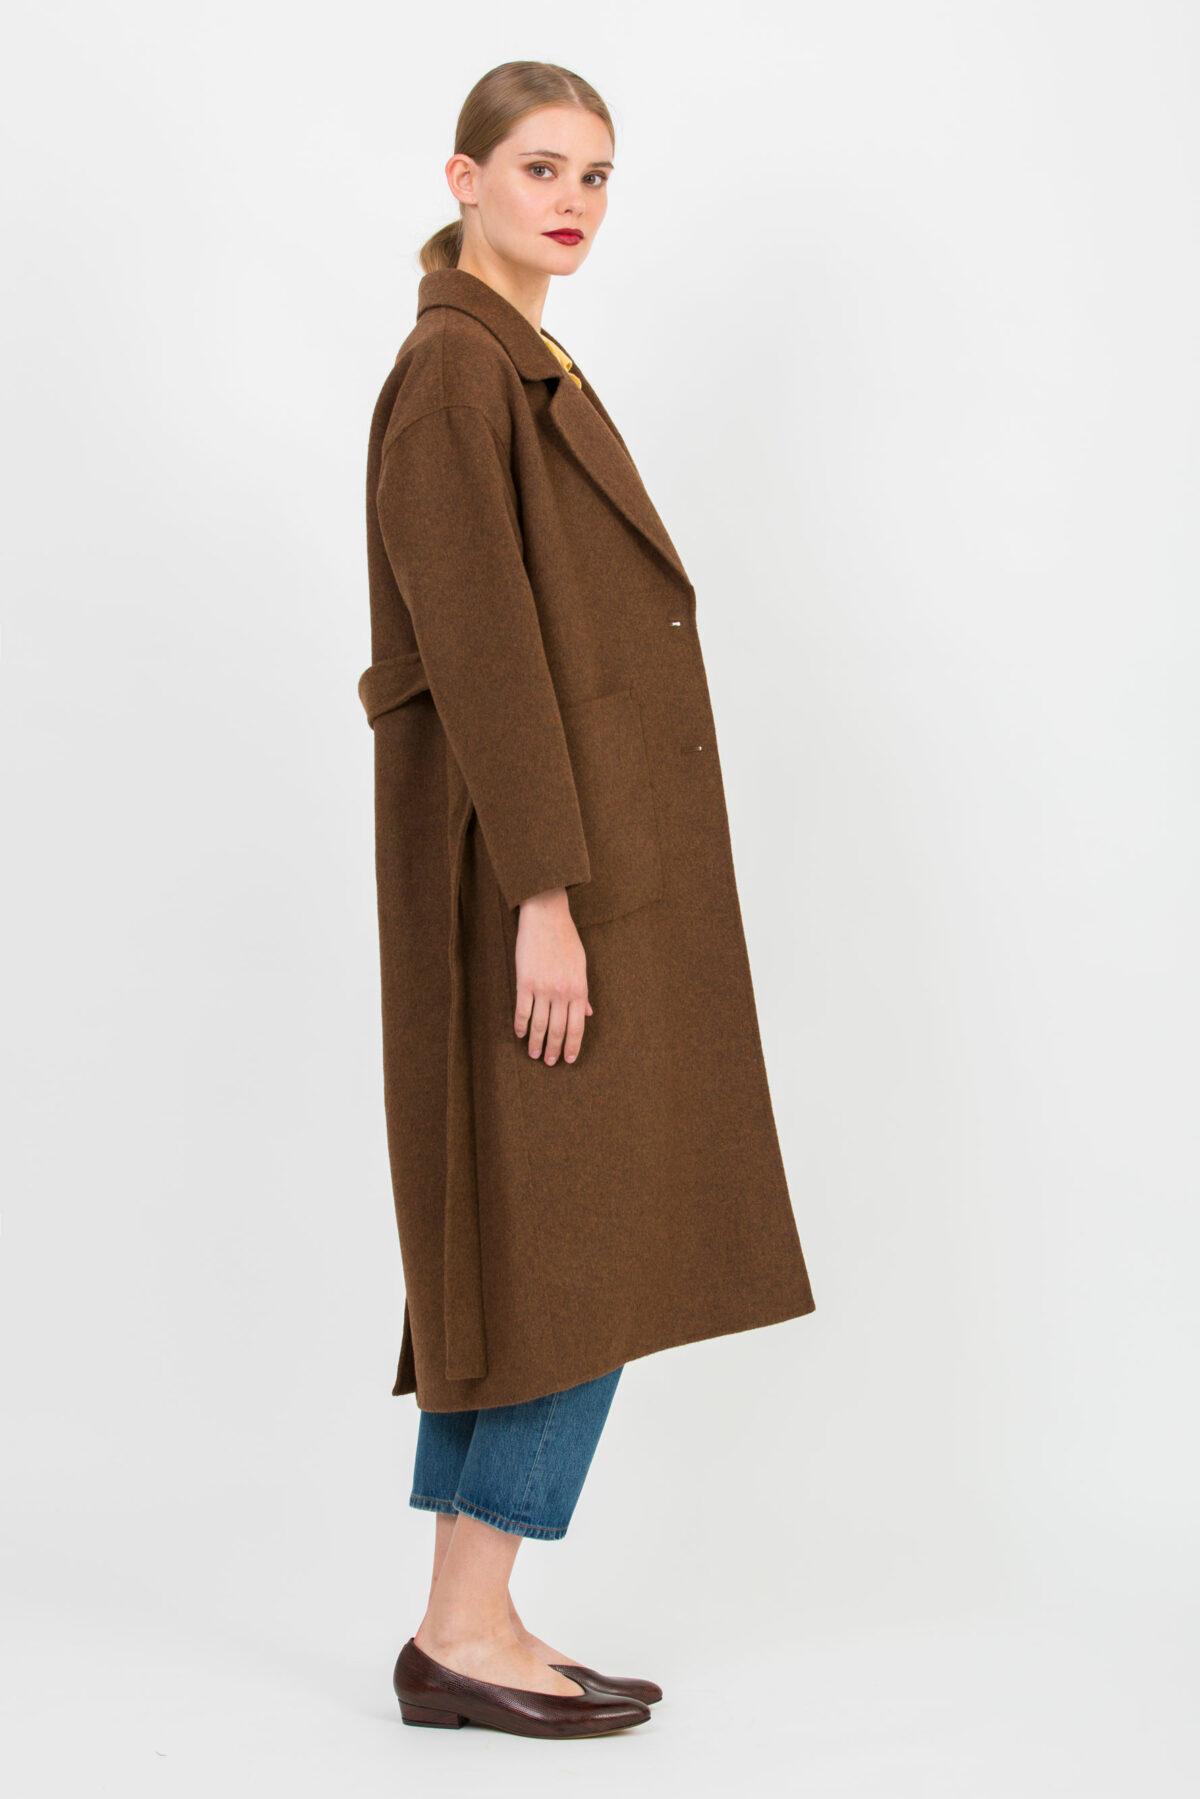 adou-love-wool-blend-coat-long-marmote-american-vintage-matchboxathens